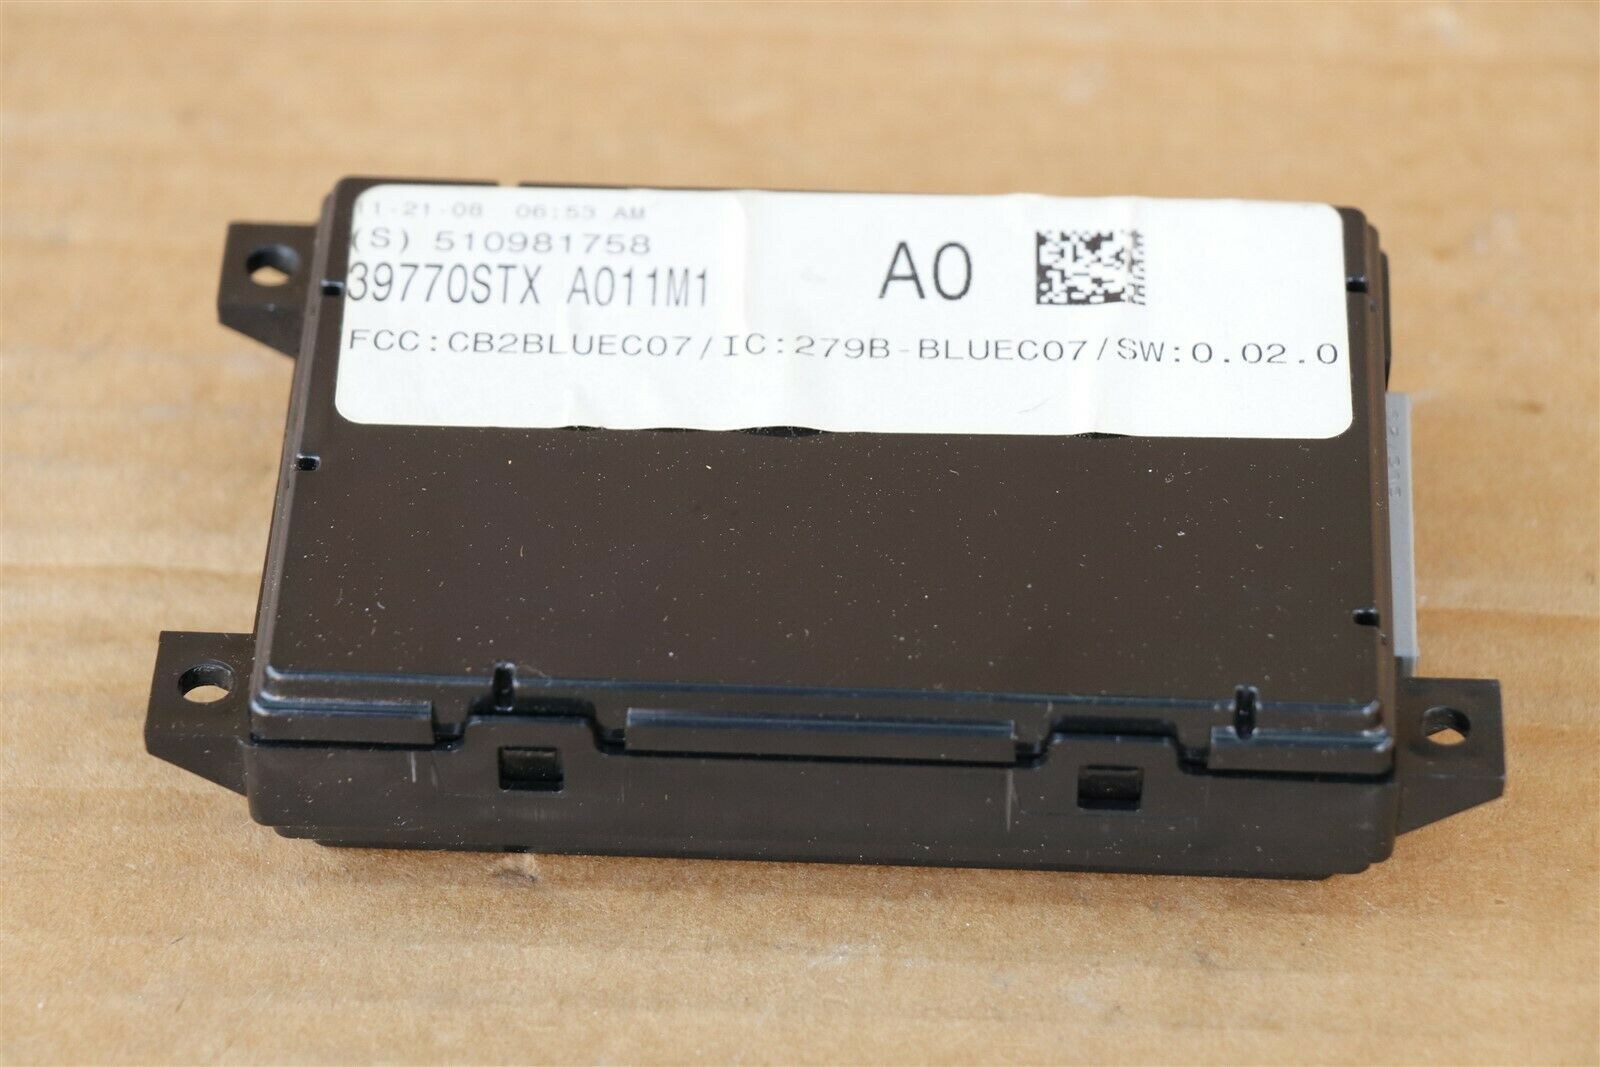 07 08 09 ACURA MDX Bluetooth Communication Control Module Link 39770-STX-A011M1